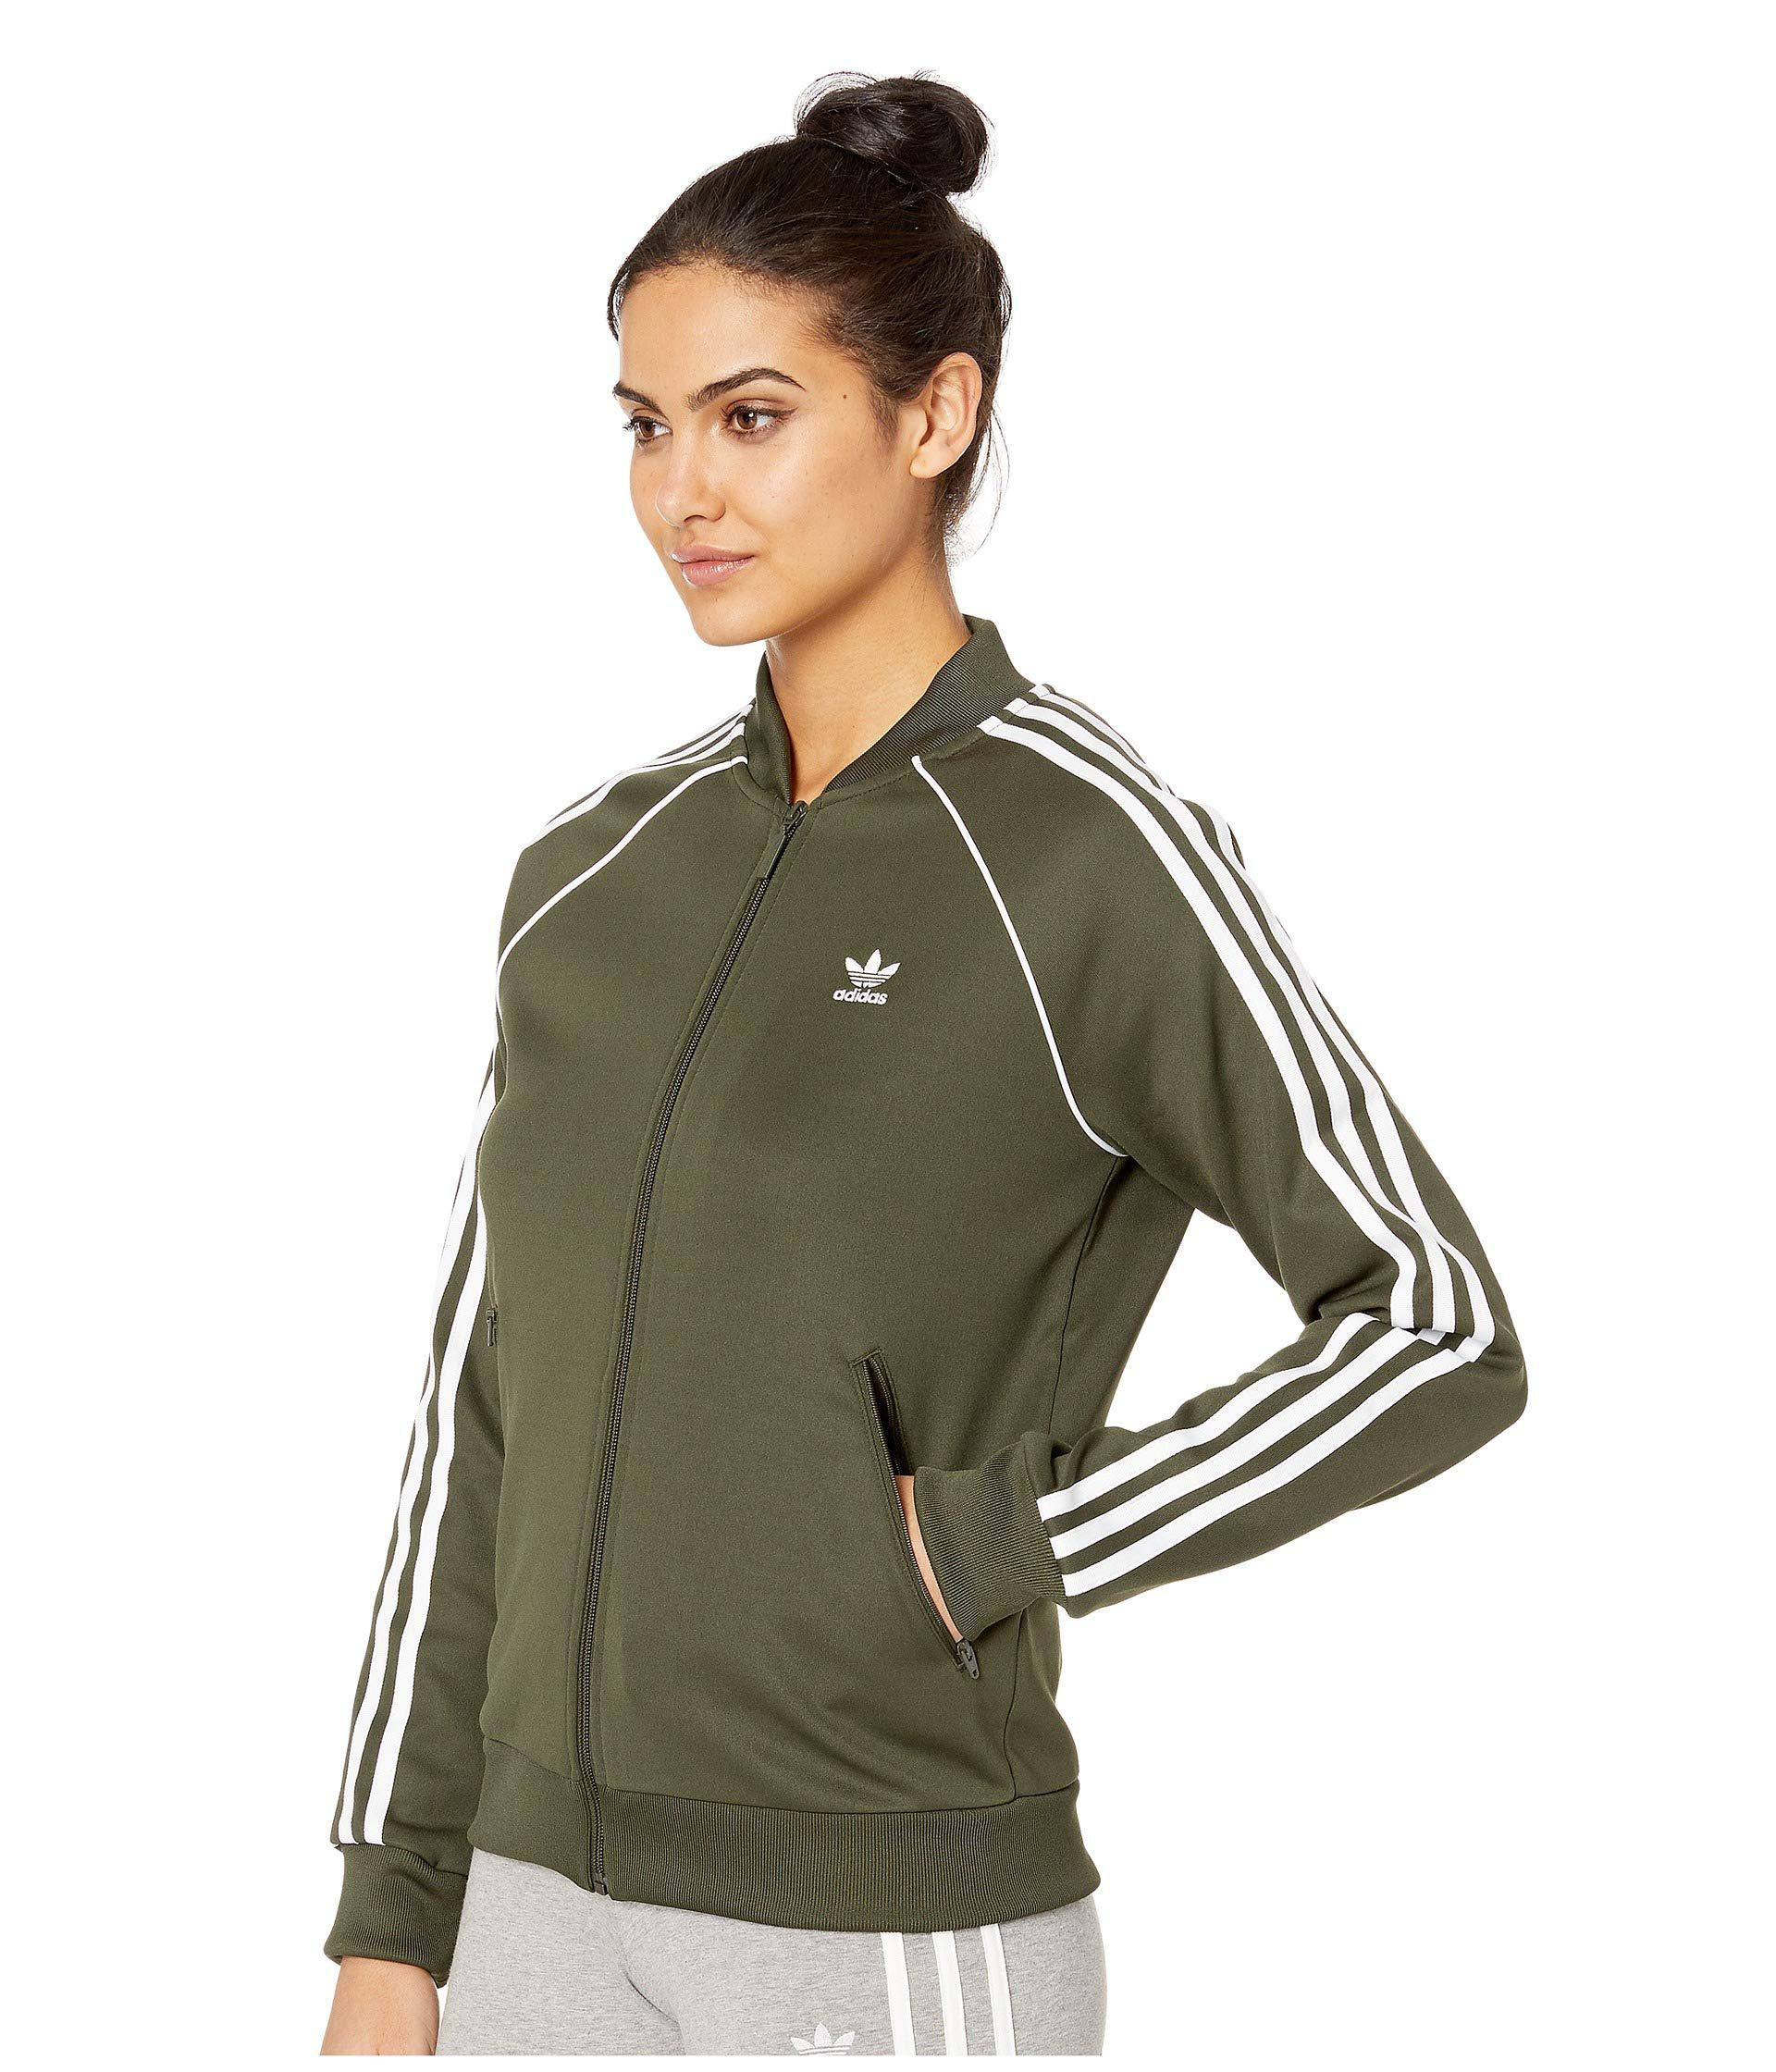 Lyst - adidas Originals Sst Track Jacket (black) Women s Coat in Green a6f548ad8